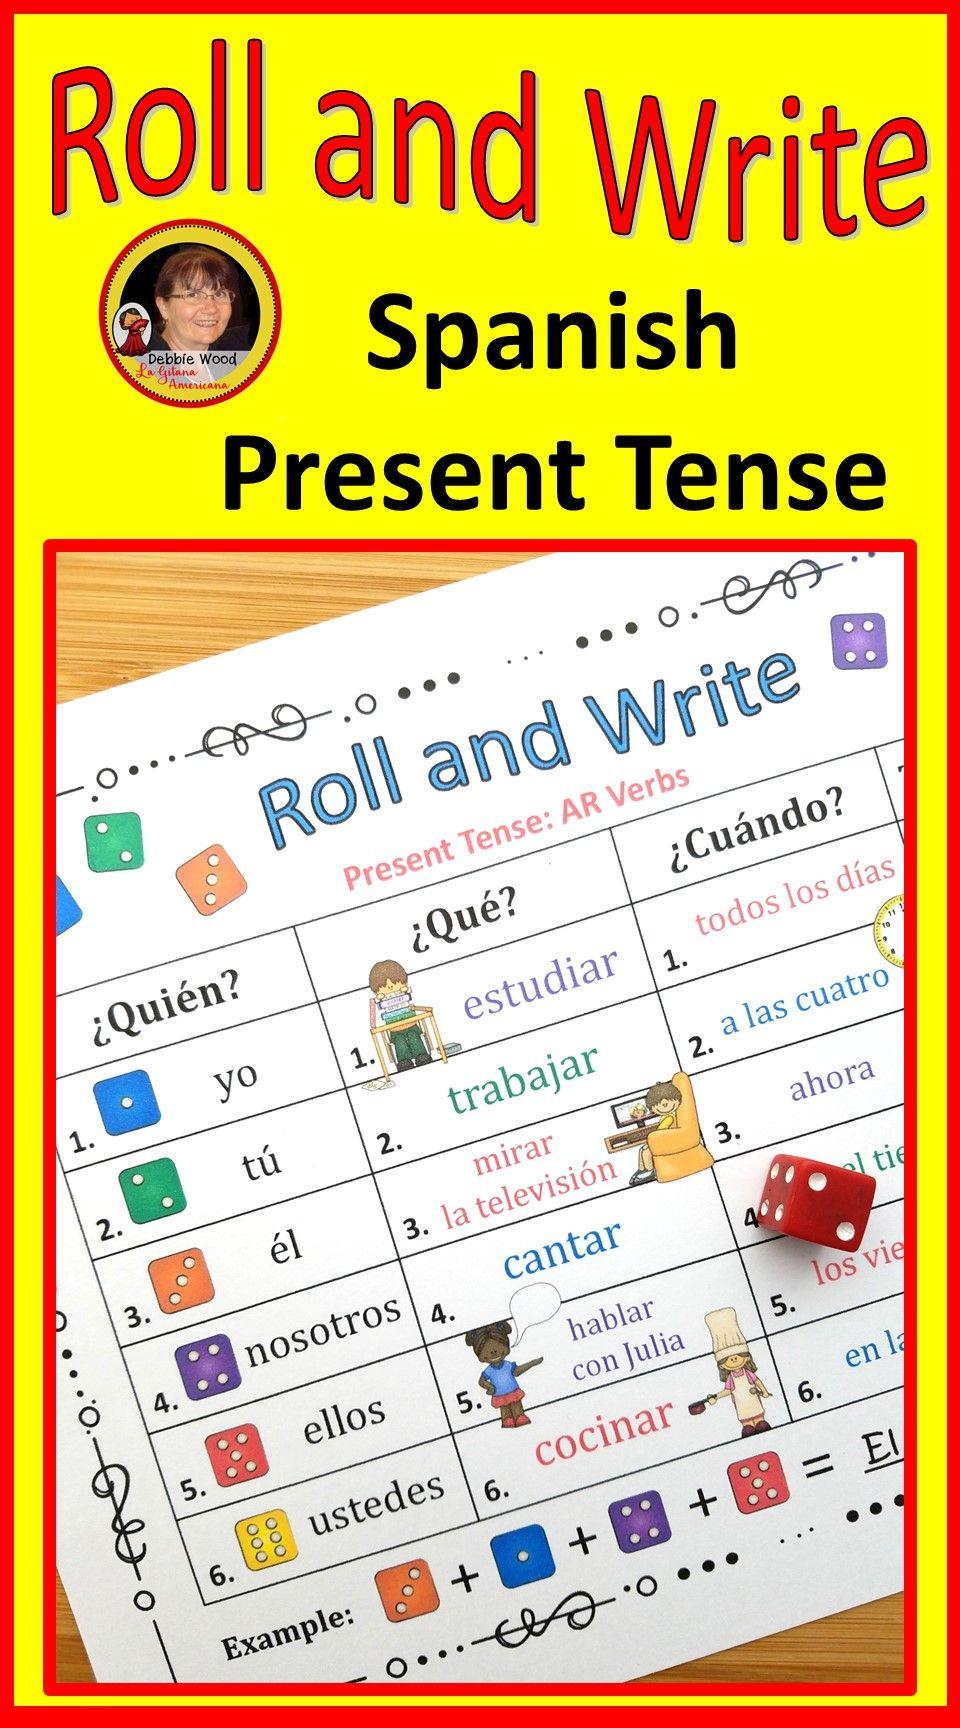 Spanish Present Tense Verbs  Spanish writing, Spanish sentences